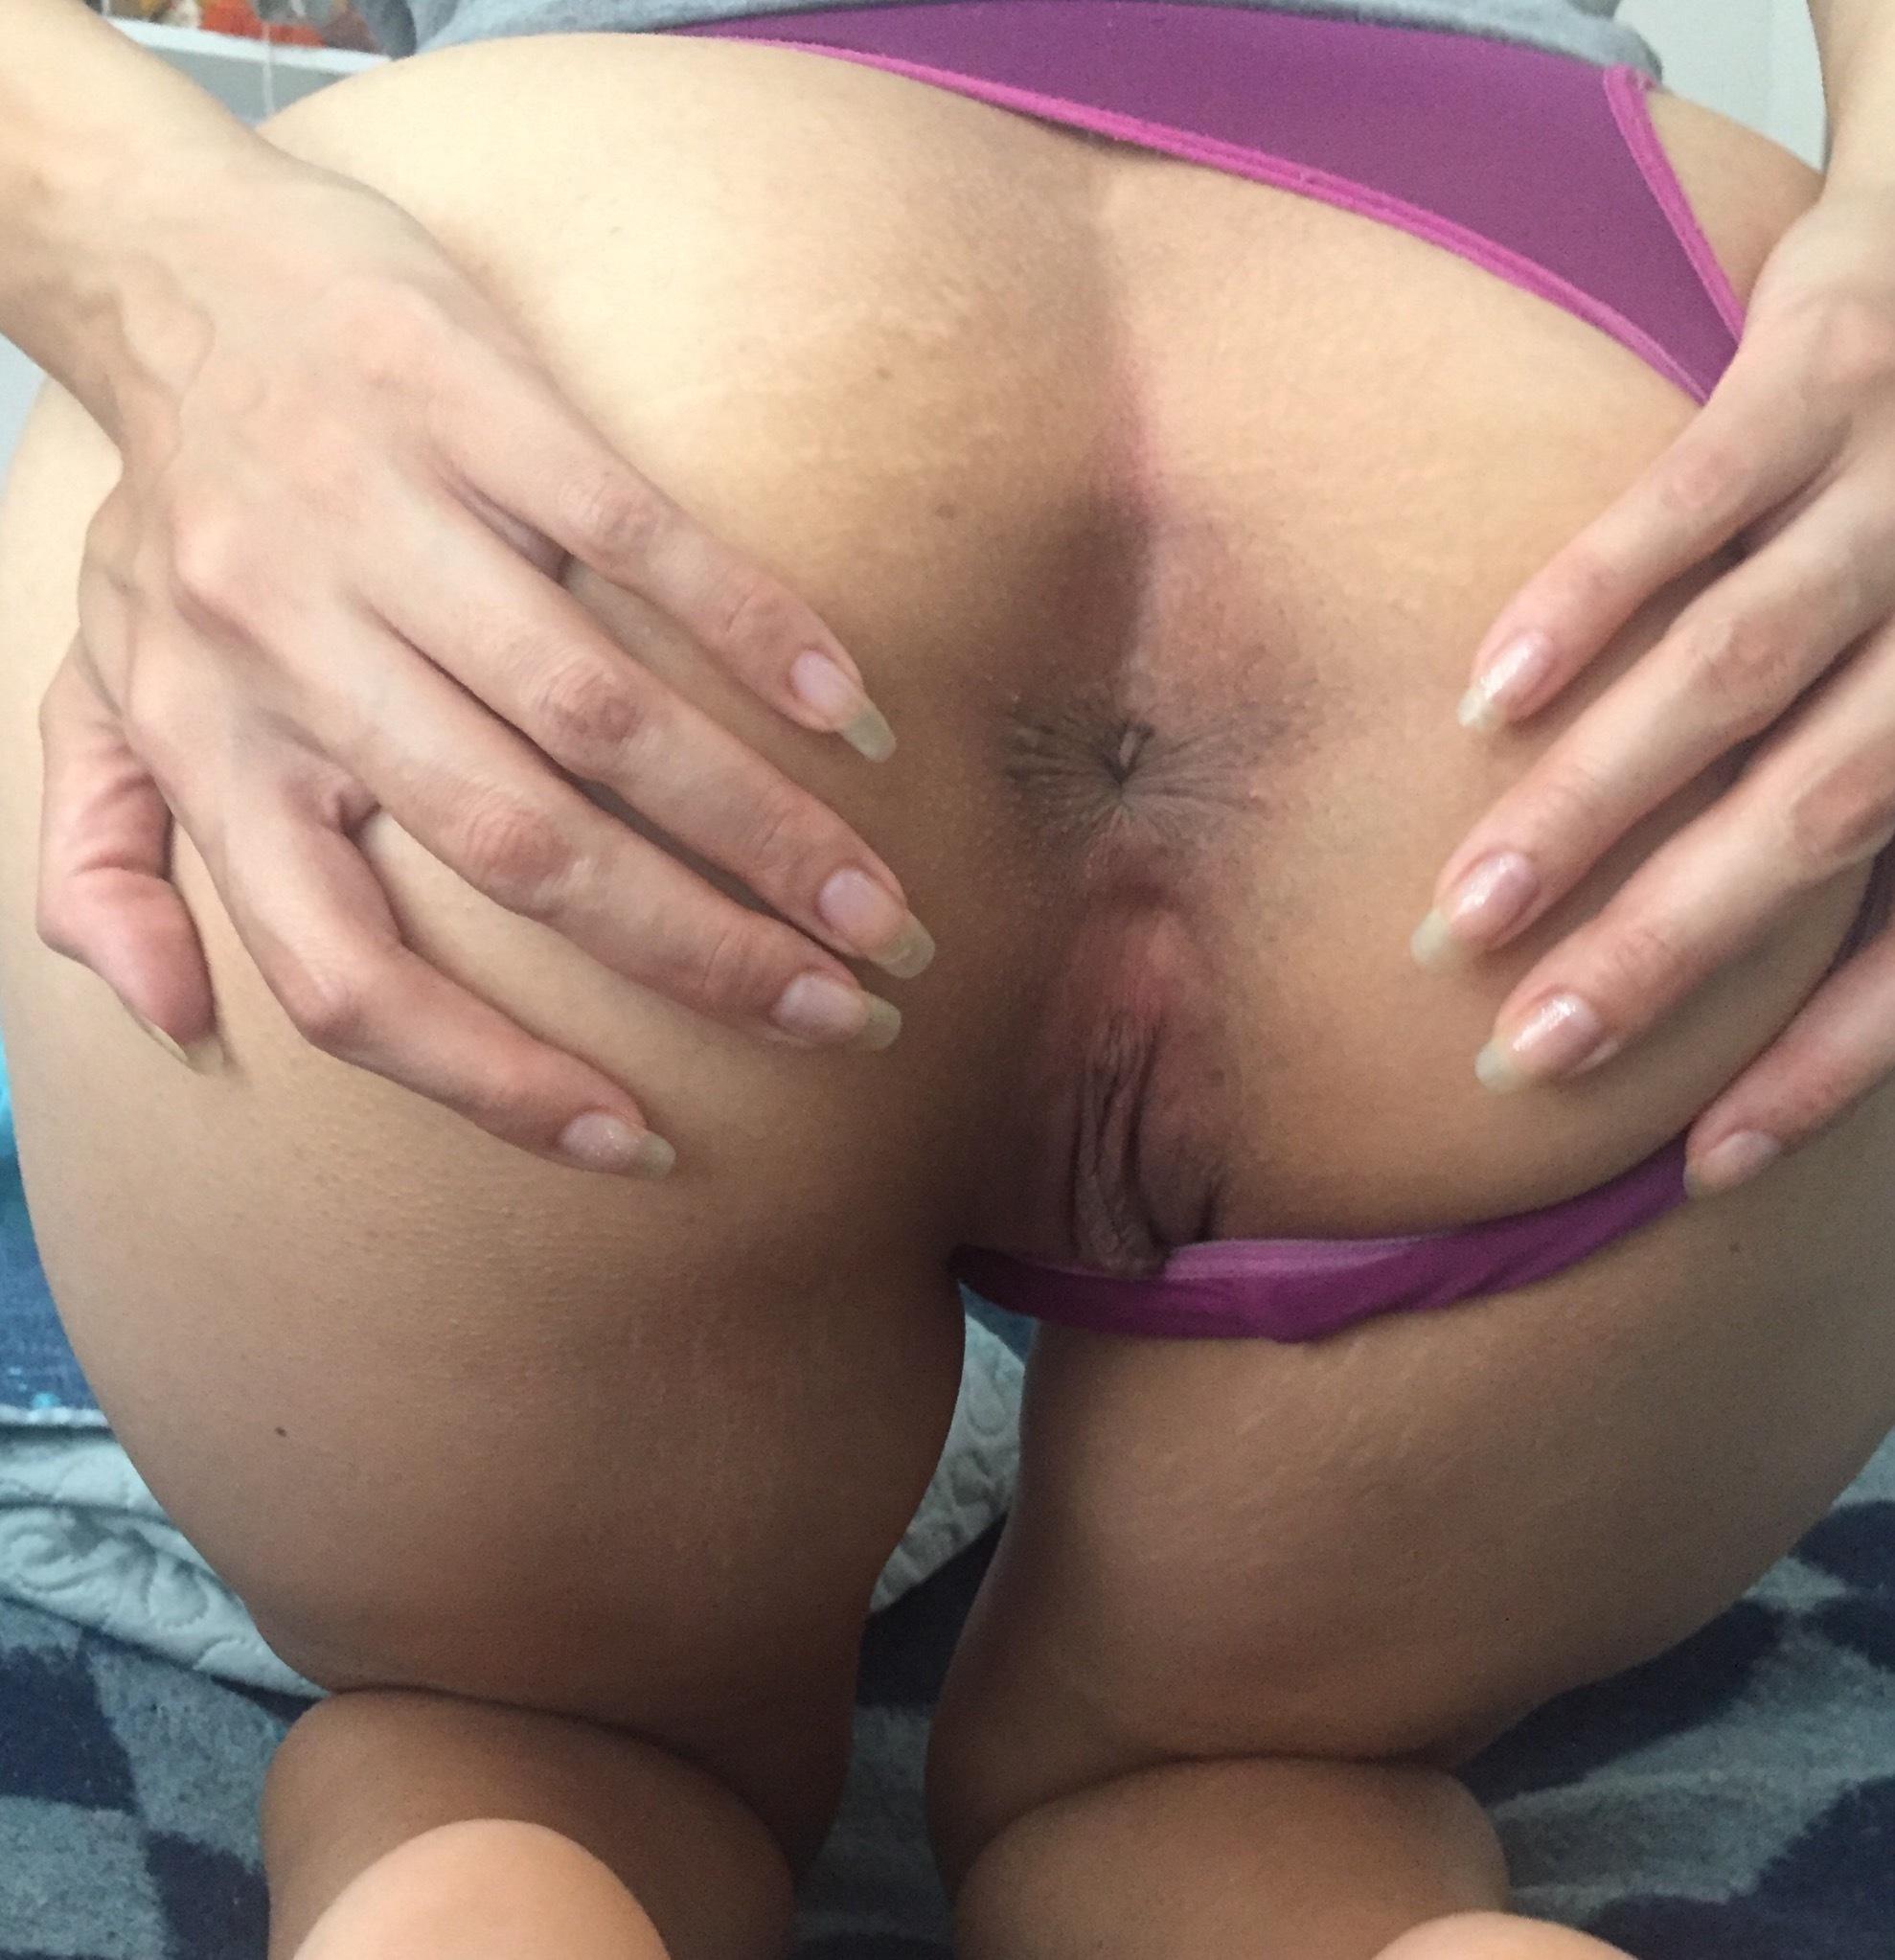 Chicas para pajas, Fotos porno para masturbarme. 1